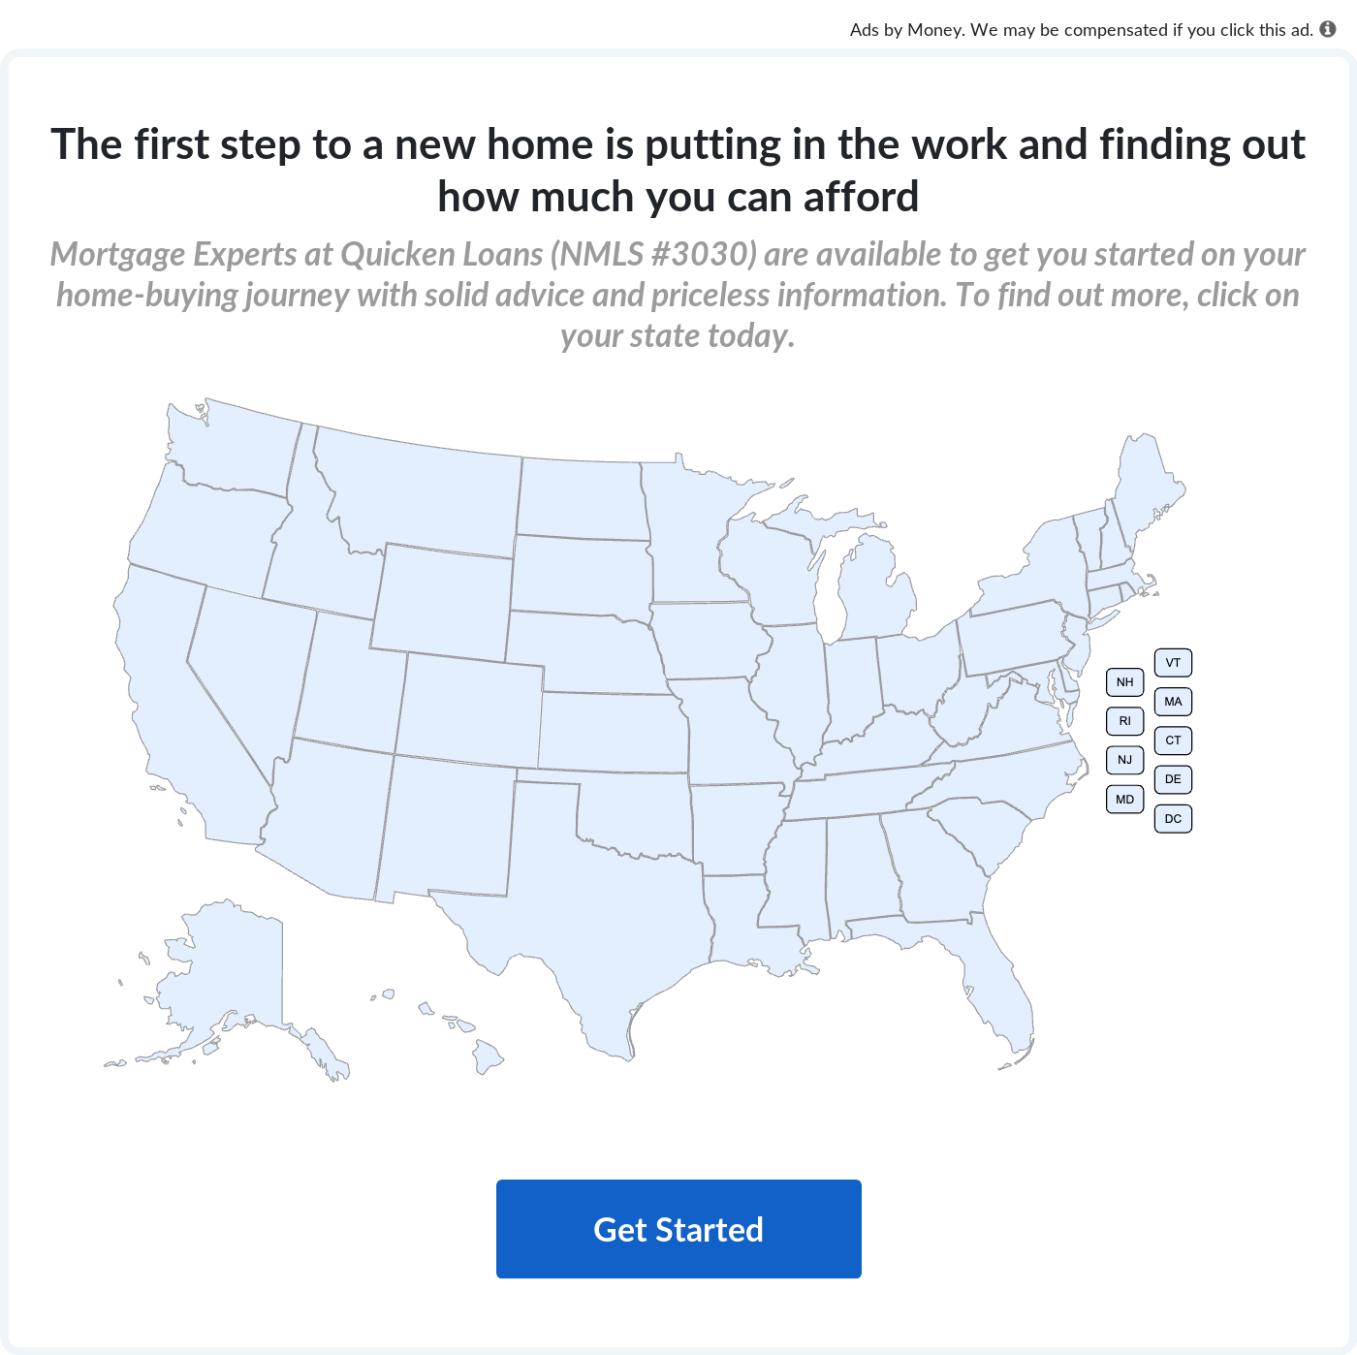 7 Best Mortgage Lenders of July 2021